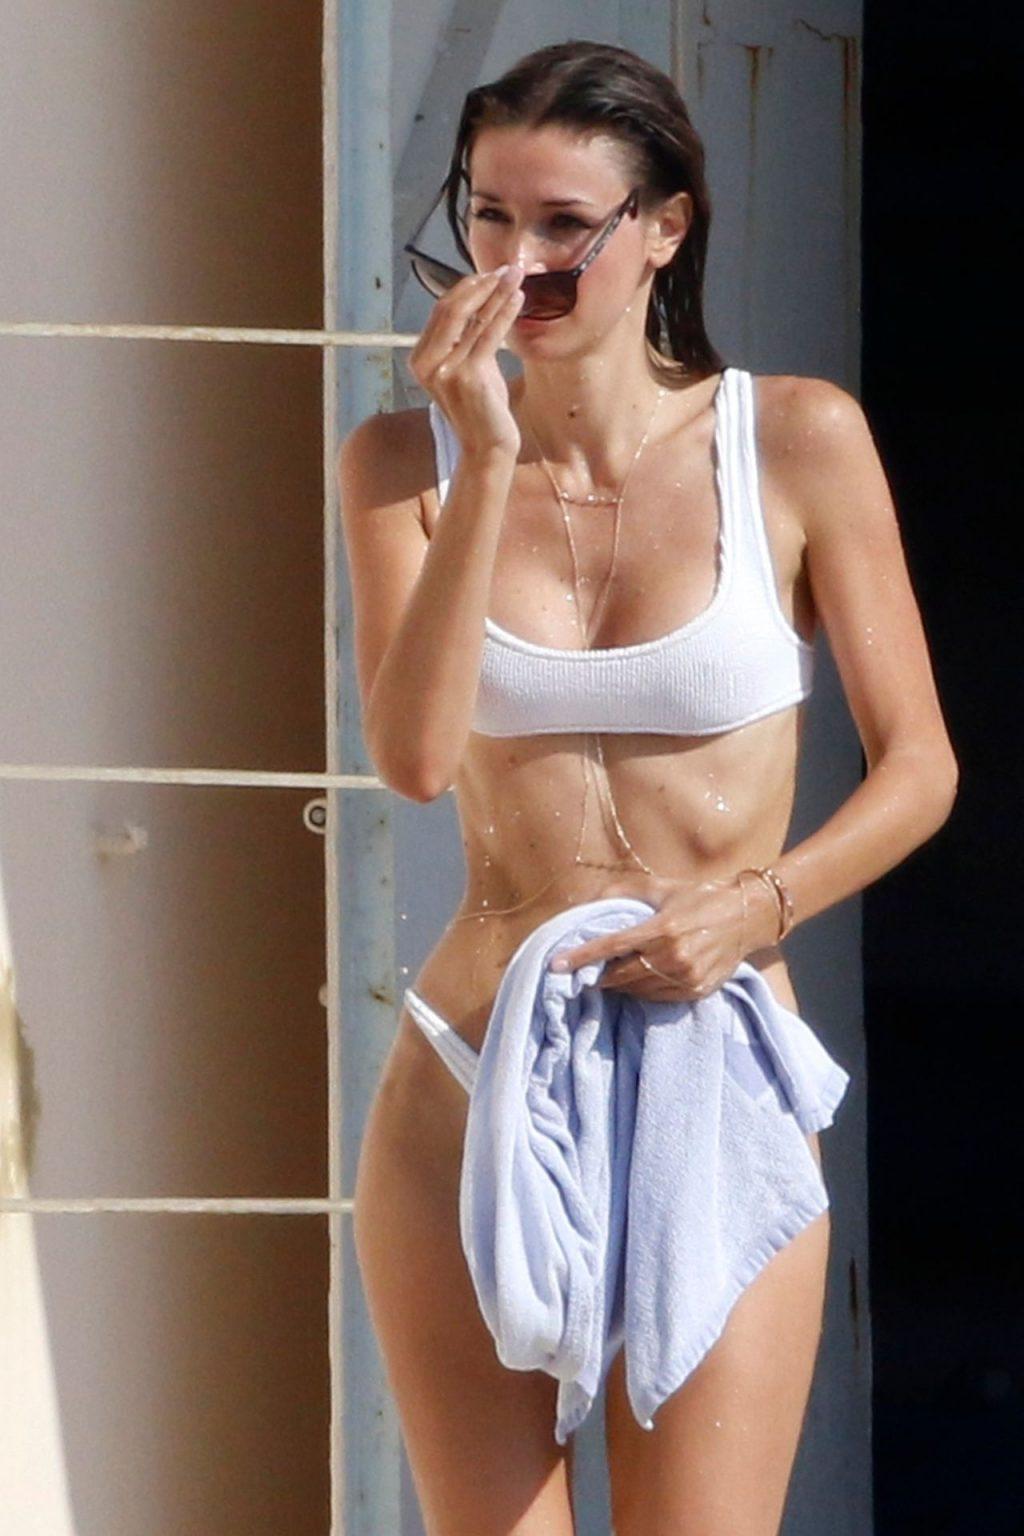 Adrien Brody's Ex Lara Leito Looks Great in a White Bikini While Soaking Up the Sun (55 Photos)